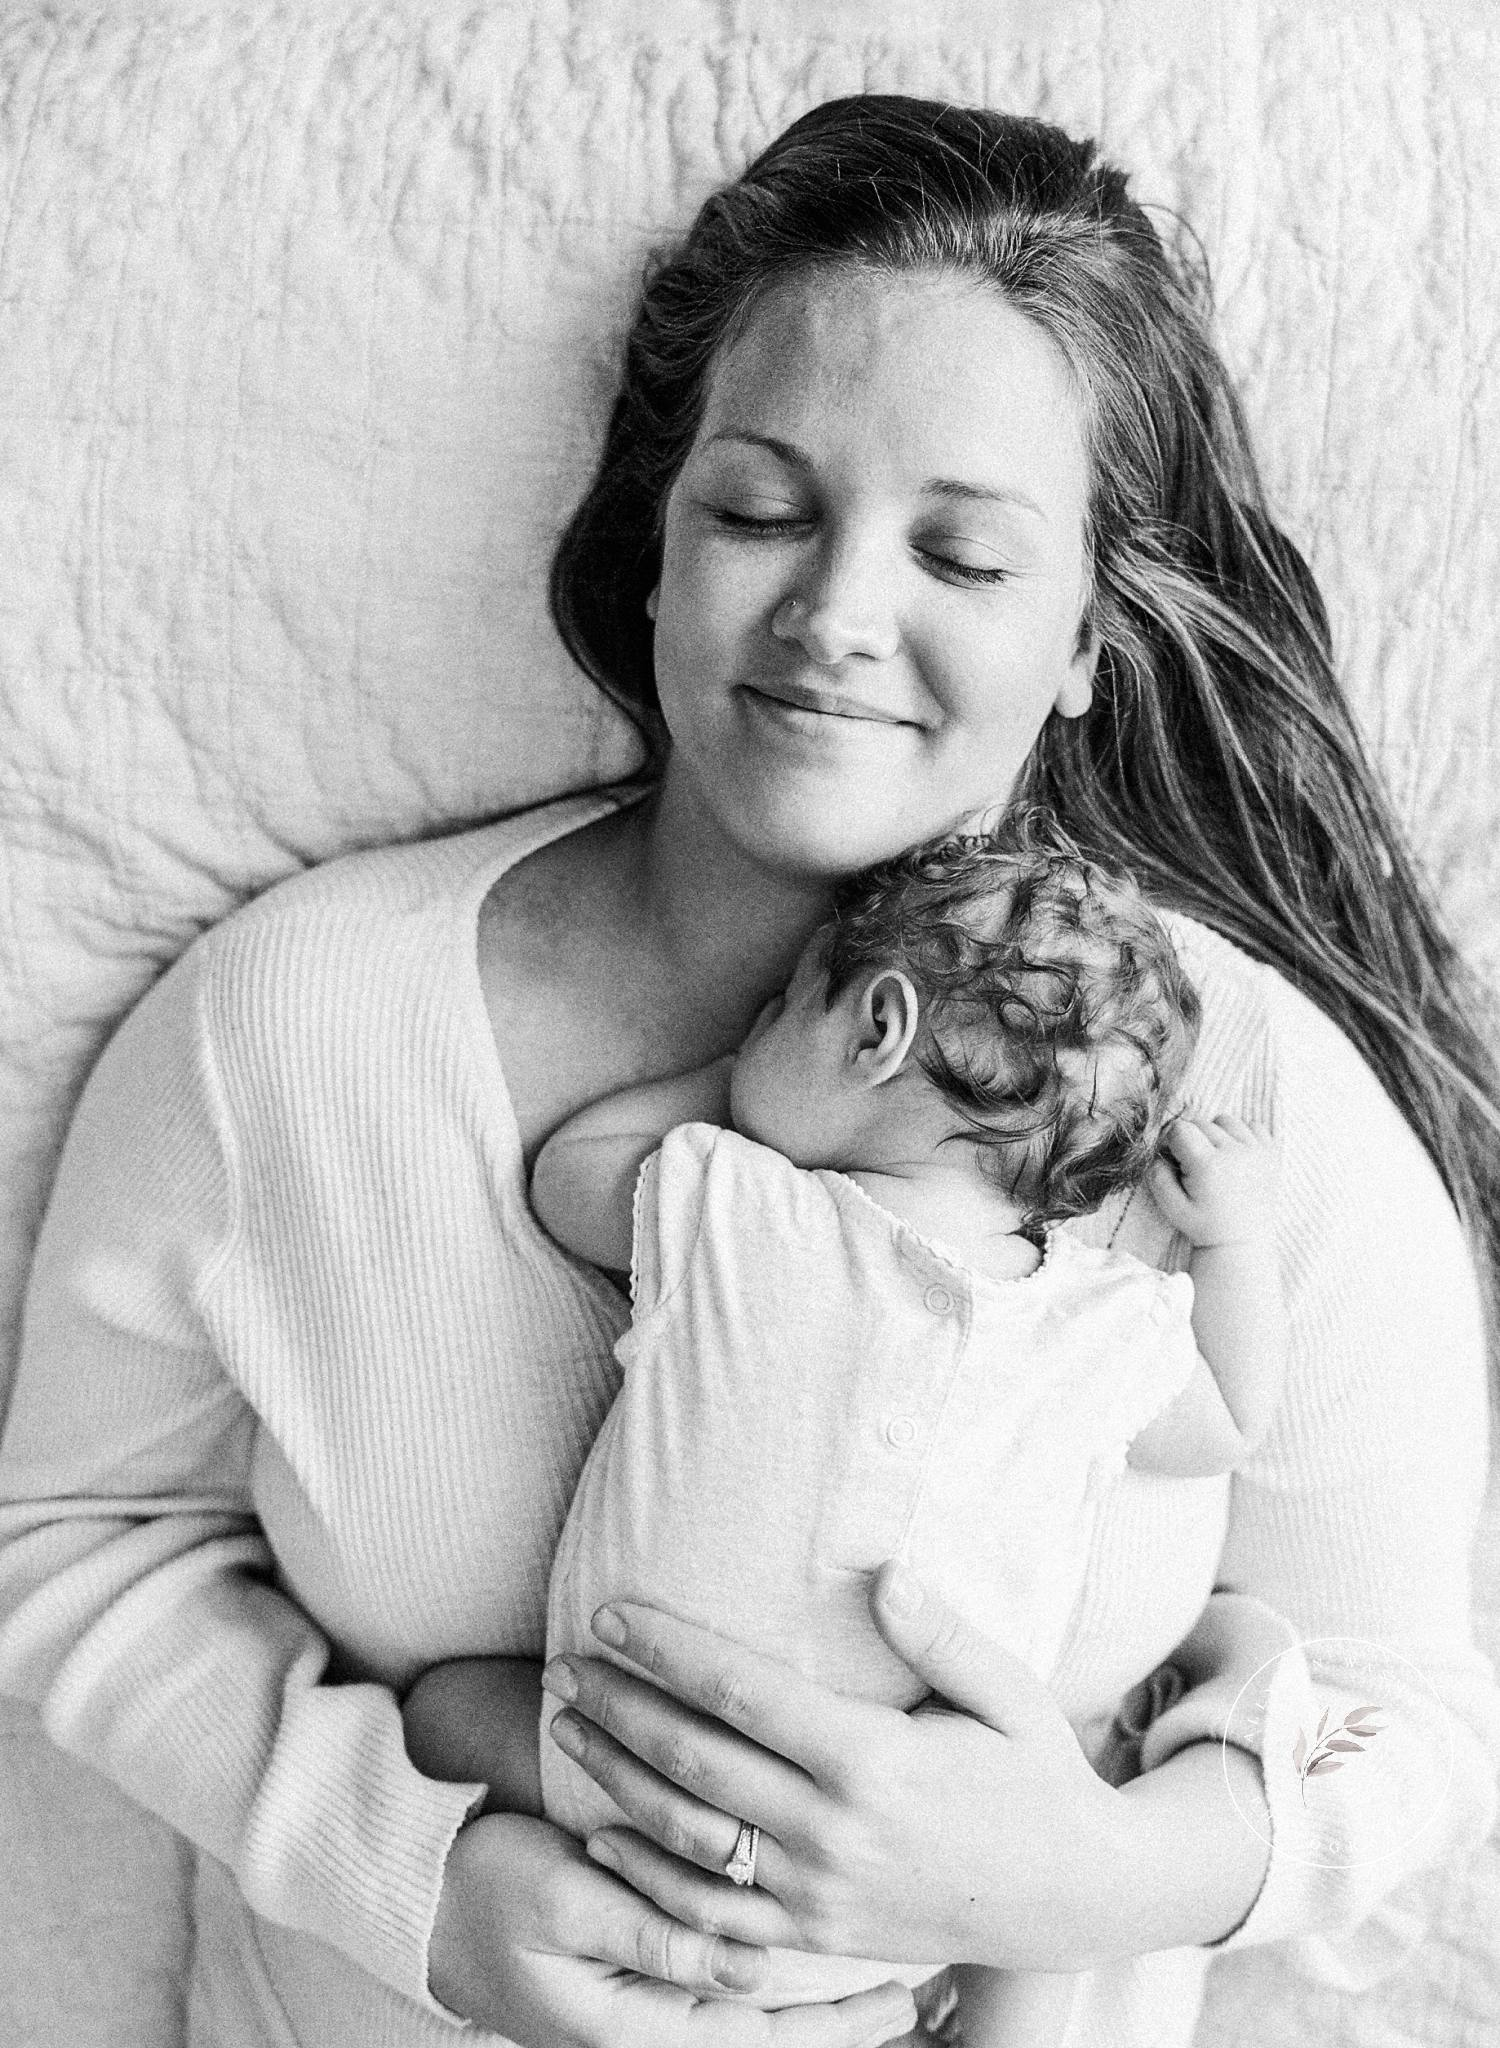 blaine-mn-newborn-photographer-baby-sylvia_0010.jpg